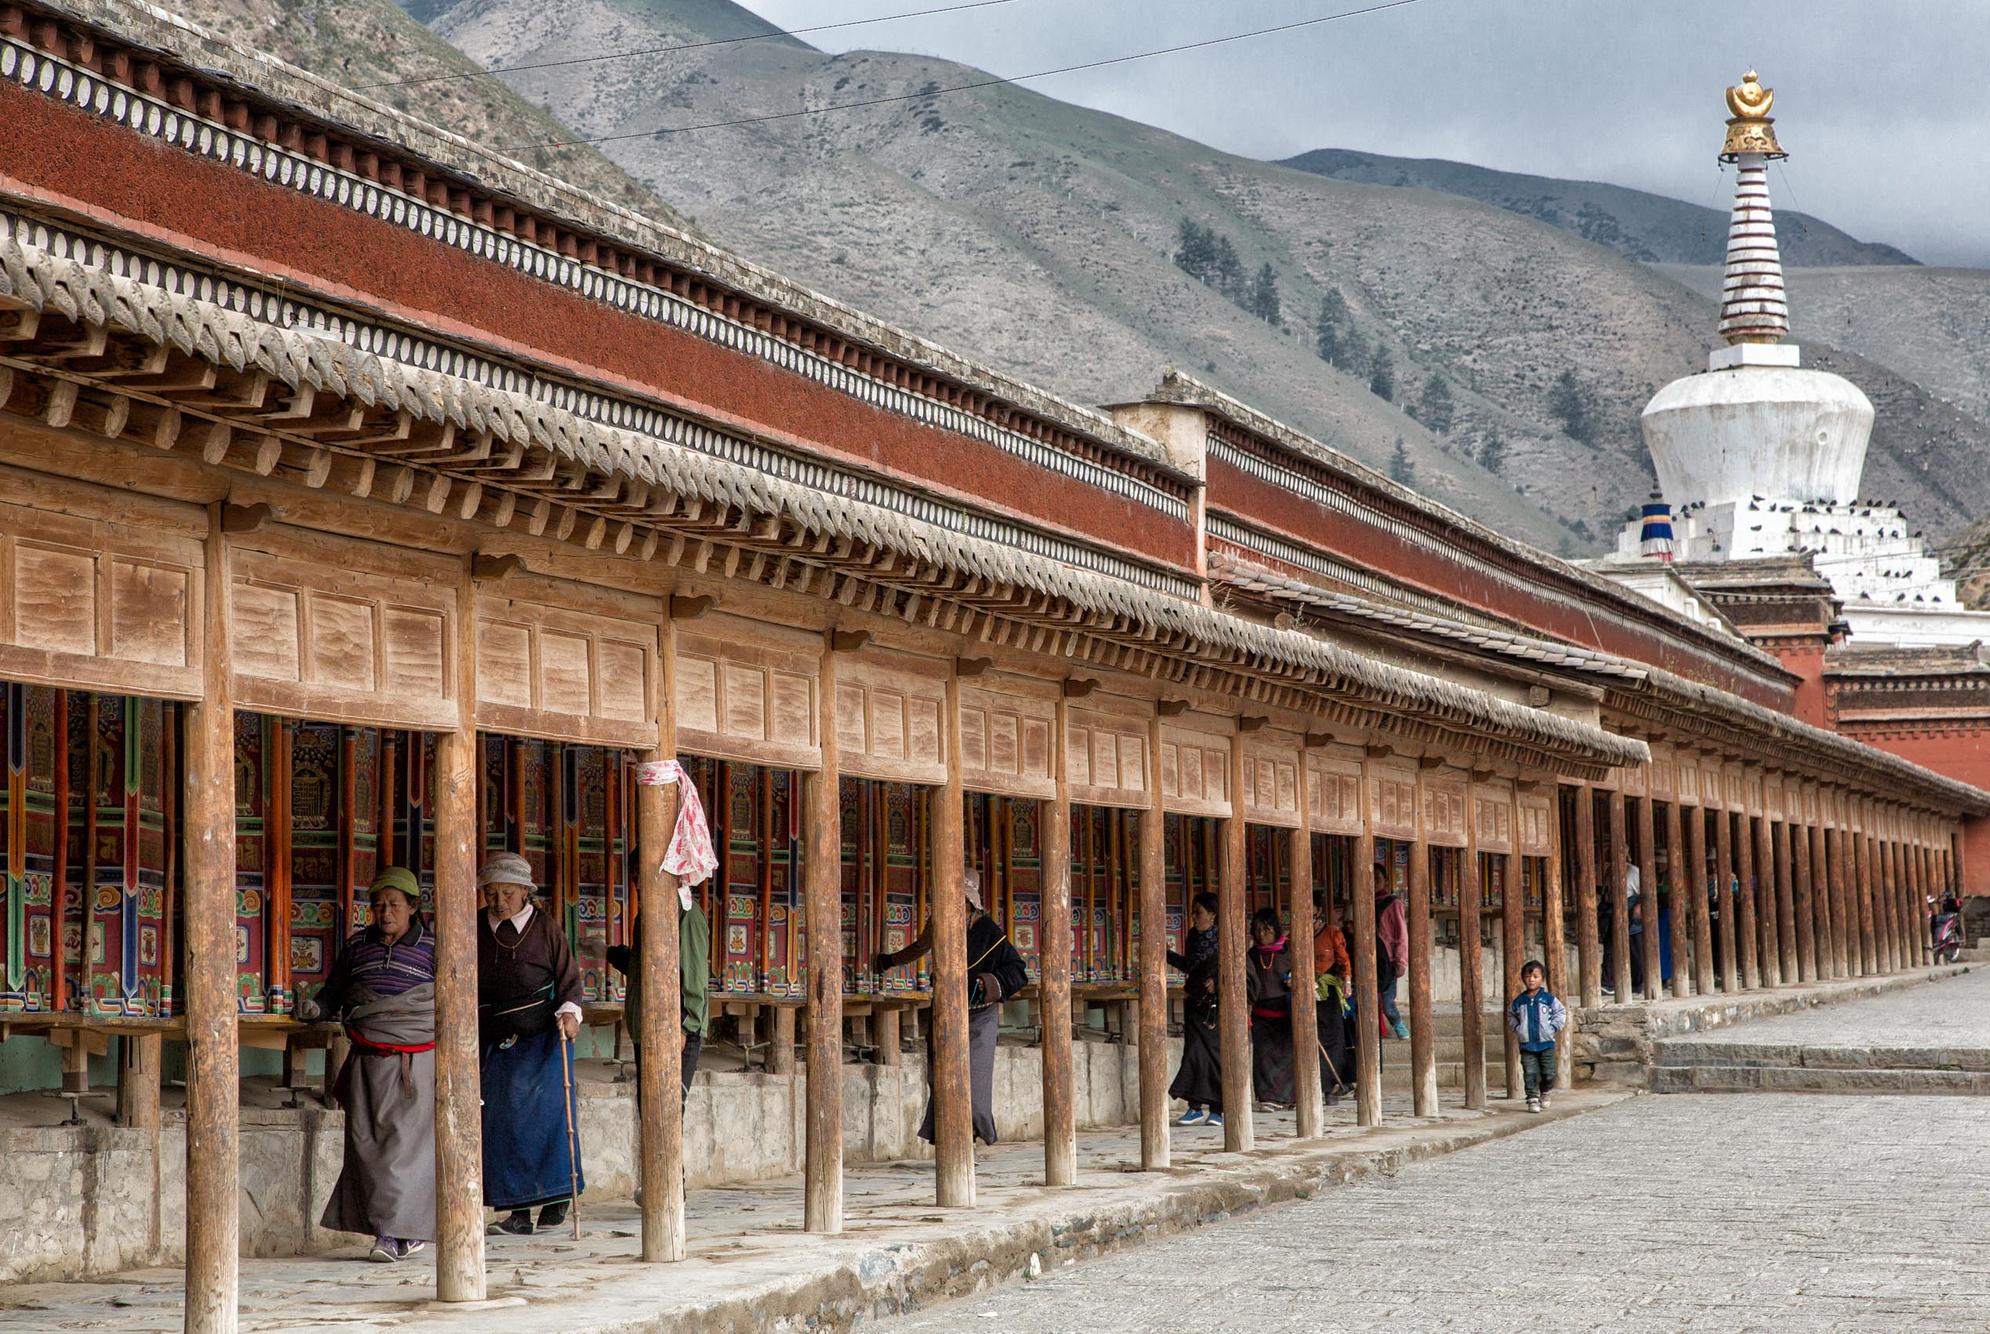 Tibetan Culture in Amdo